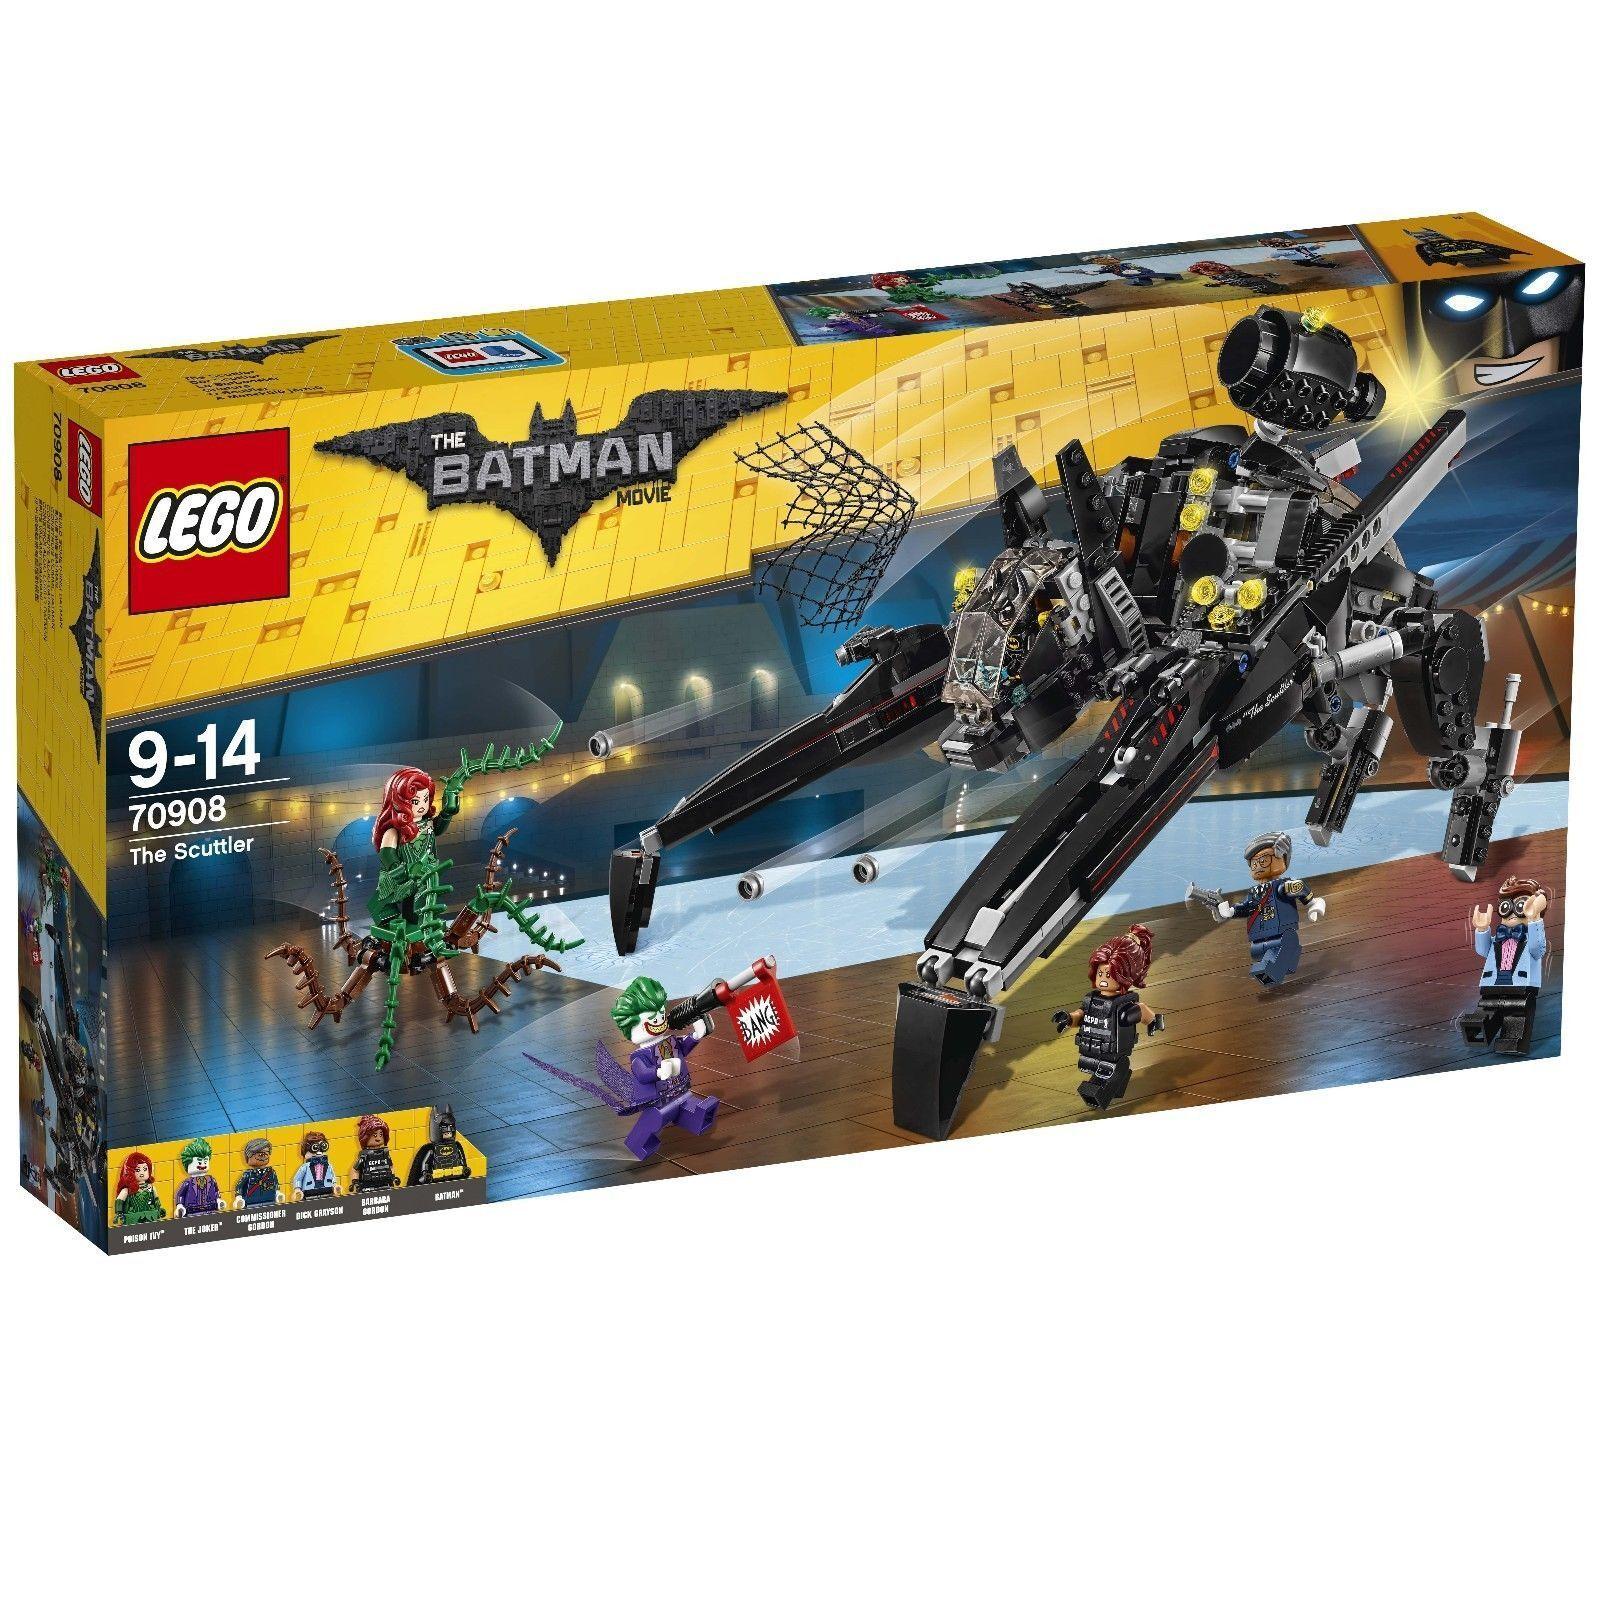 LEGO 70908 THE BATMAN MOVIE The Scuttler